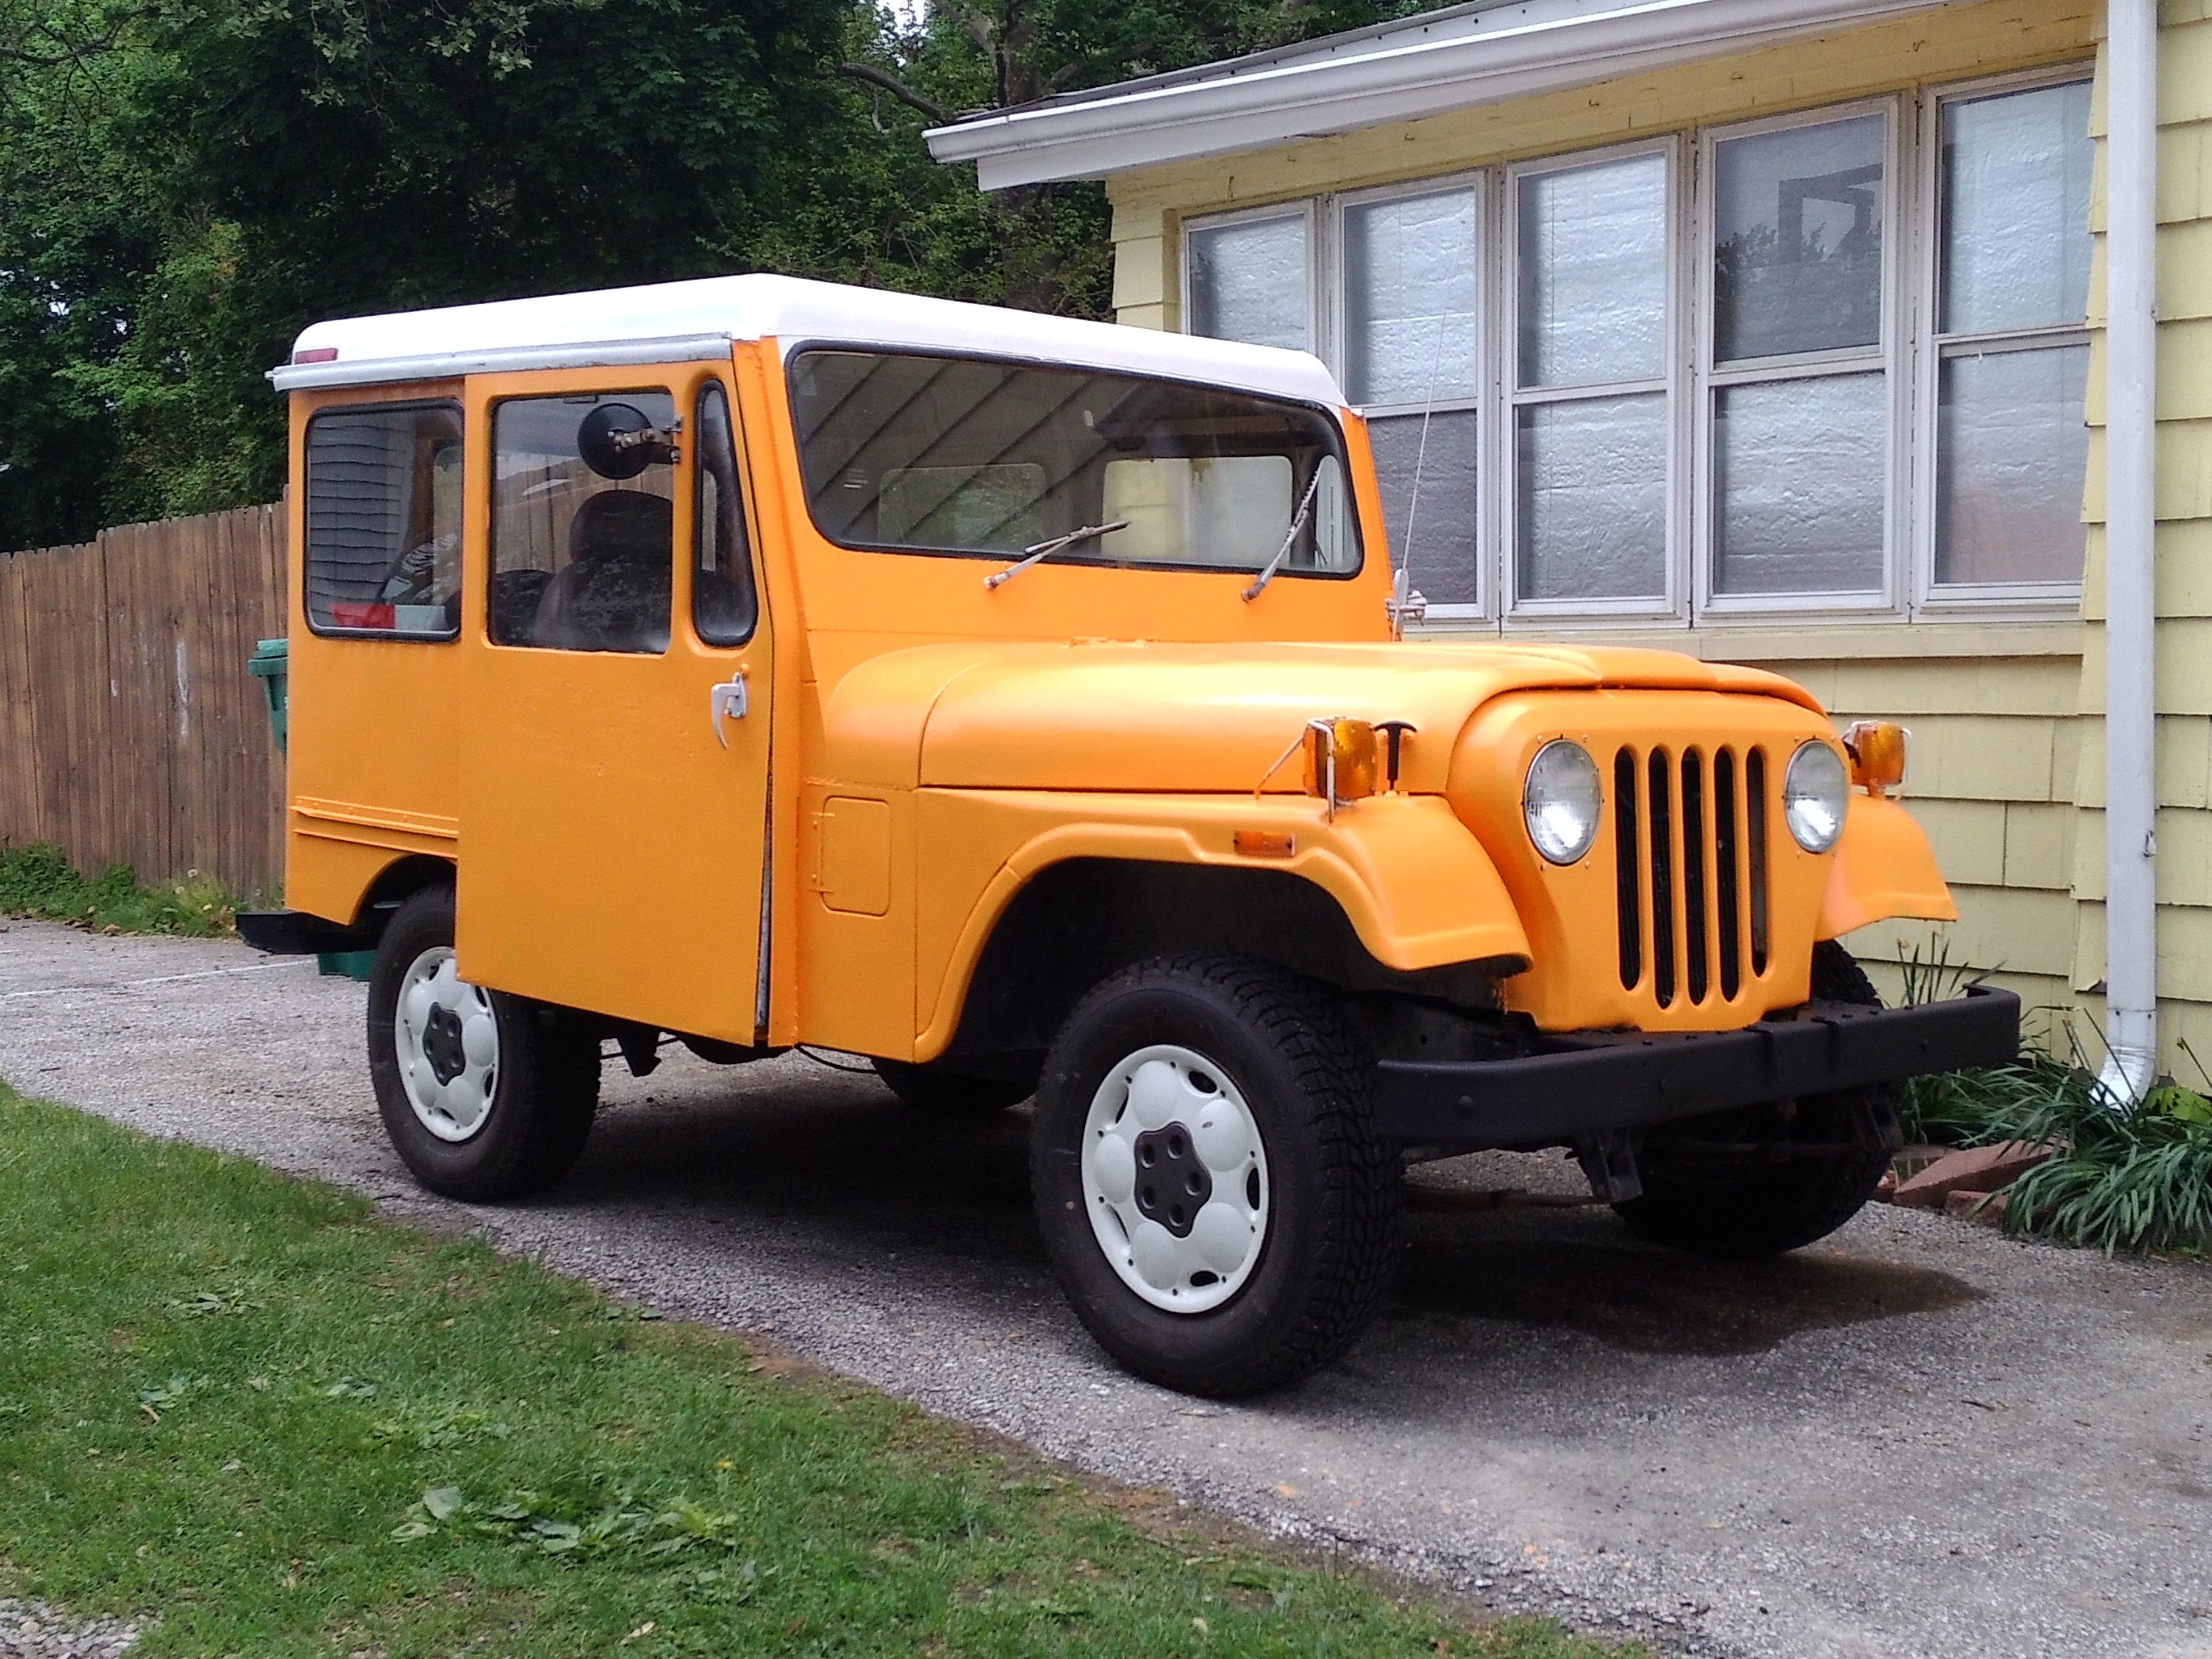 Jeep Archives - AndyRupert com